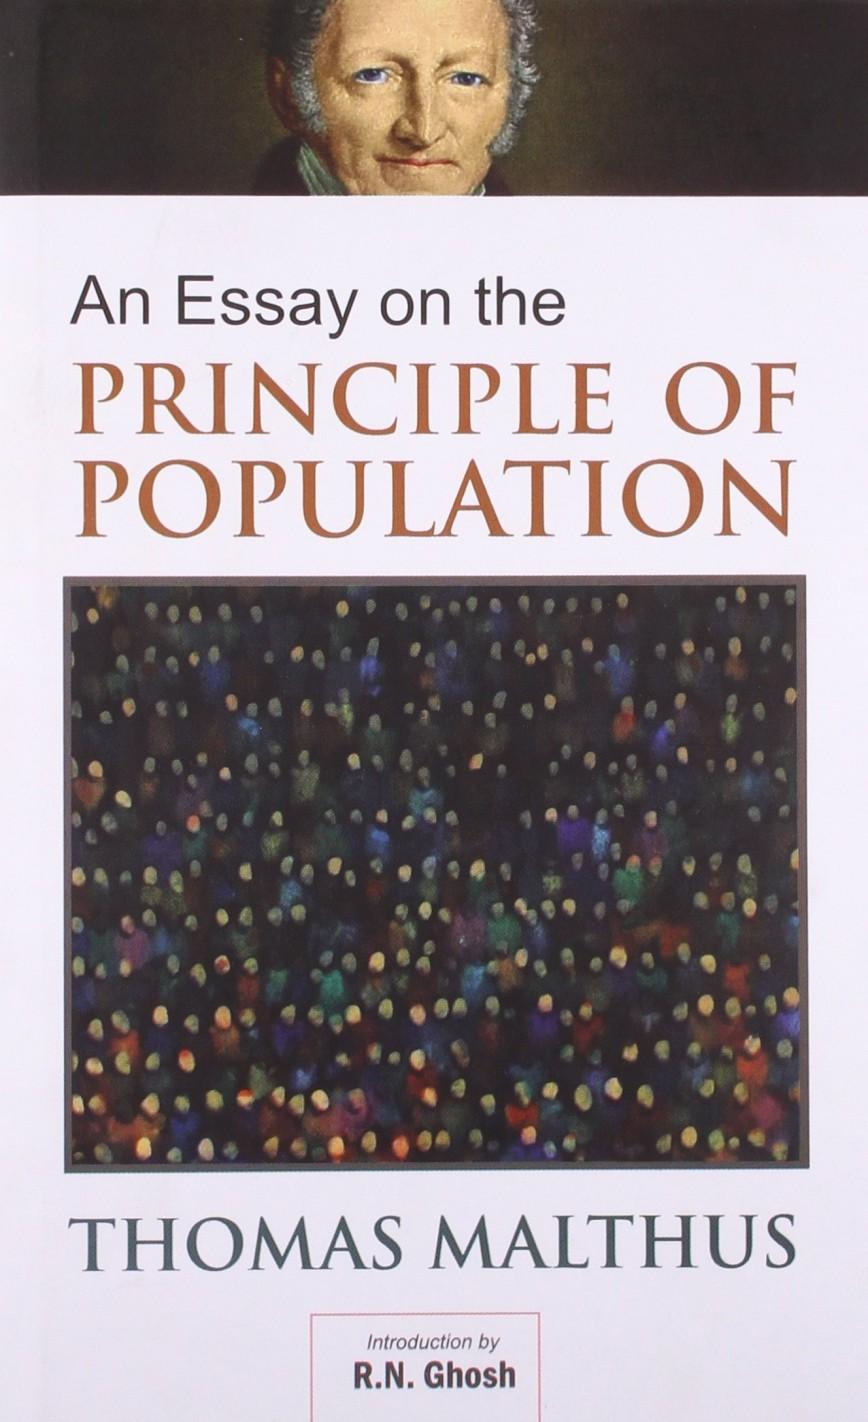 006 Essay On The Principle Of Population 8162bfm1ycfl Singular Malthus Sparknotes Thomas Main Idea 868